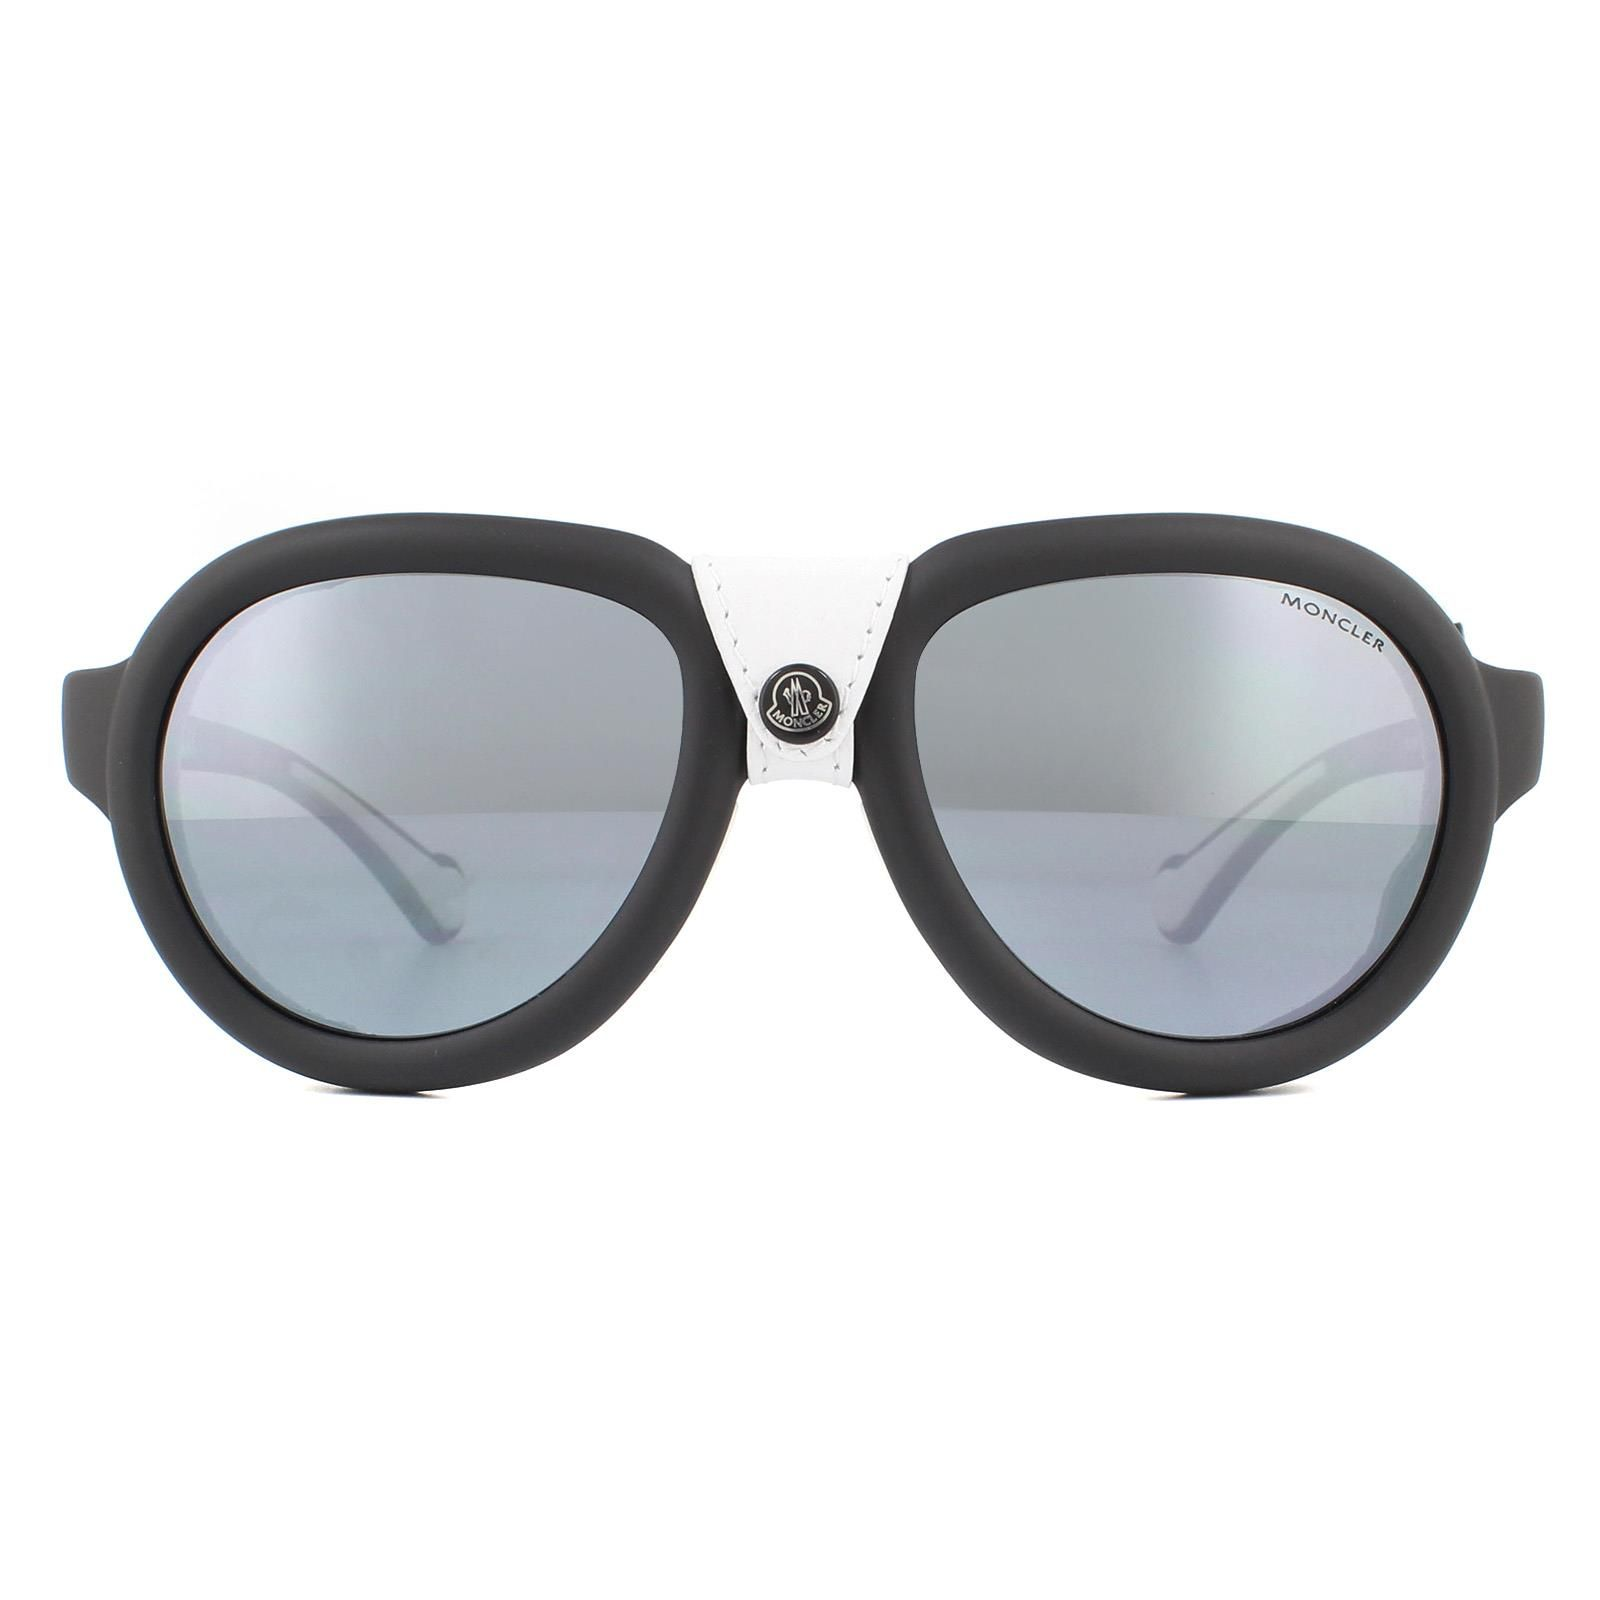 Moncler Sunglasses ML0090 02D Matte Black White Grey Polarized